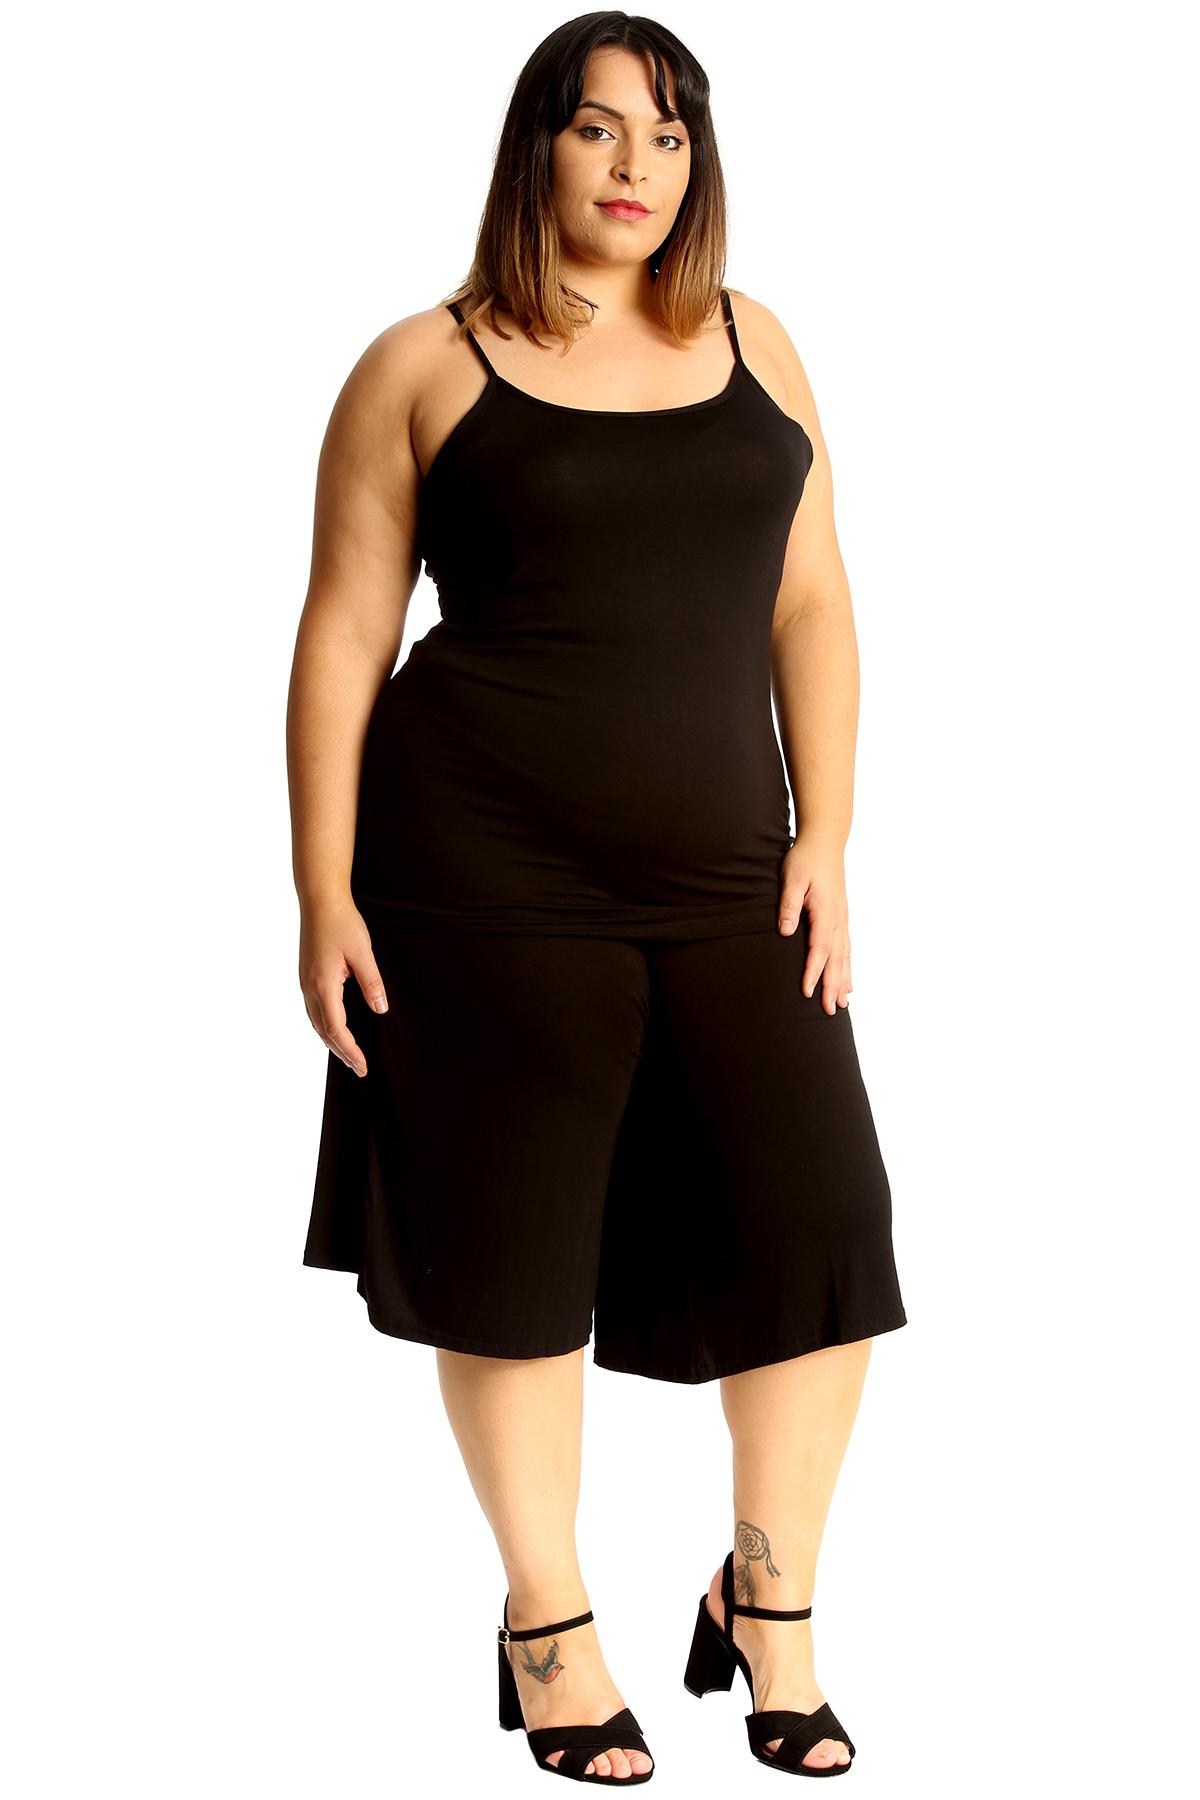 New-Womens-Plus-Size-Culottes-Ladies-Plain-Shorts-Palazzo-Elastic-Pants-Summer thumbnail 15